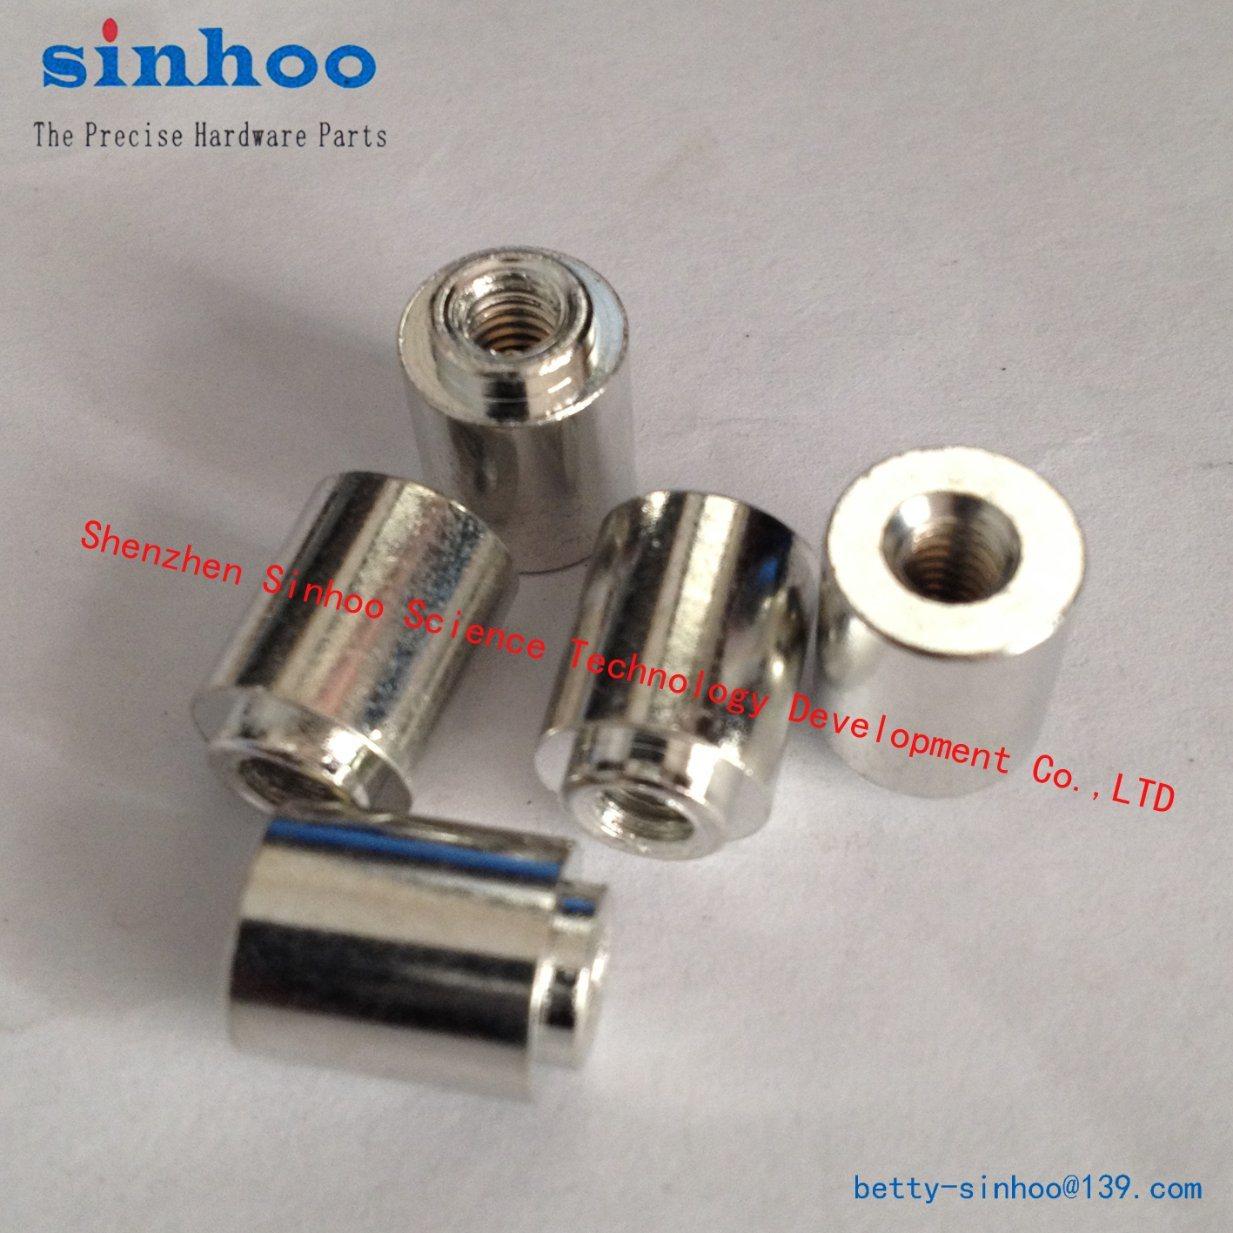 Smtso-M2.5-8et, SMD Nut, Weld Nut, Reelfast/Surface Mount Fasteners/SMT Standoff/SMT Nut, Steel Bulk